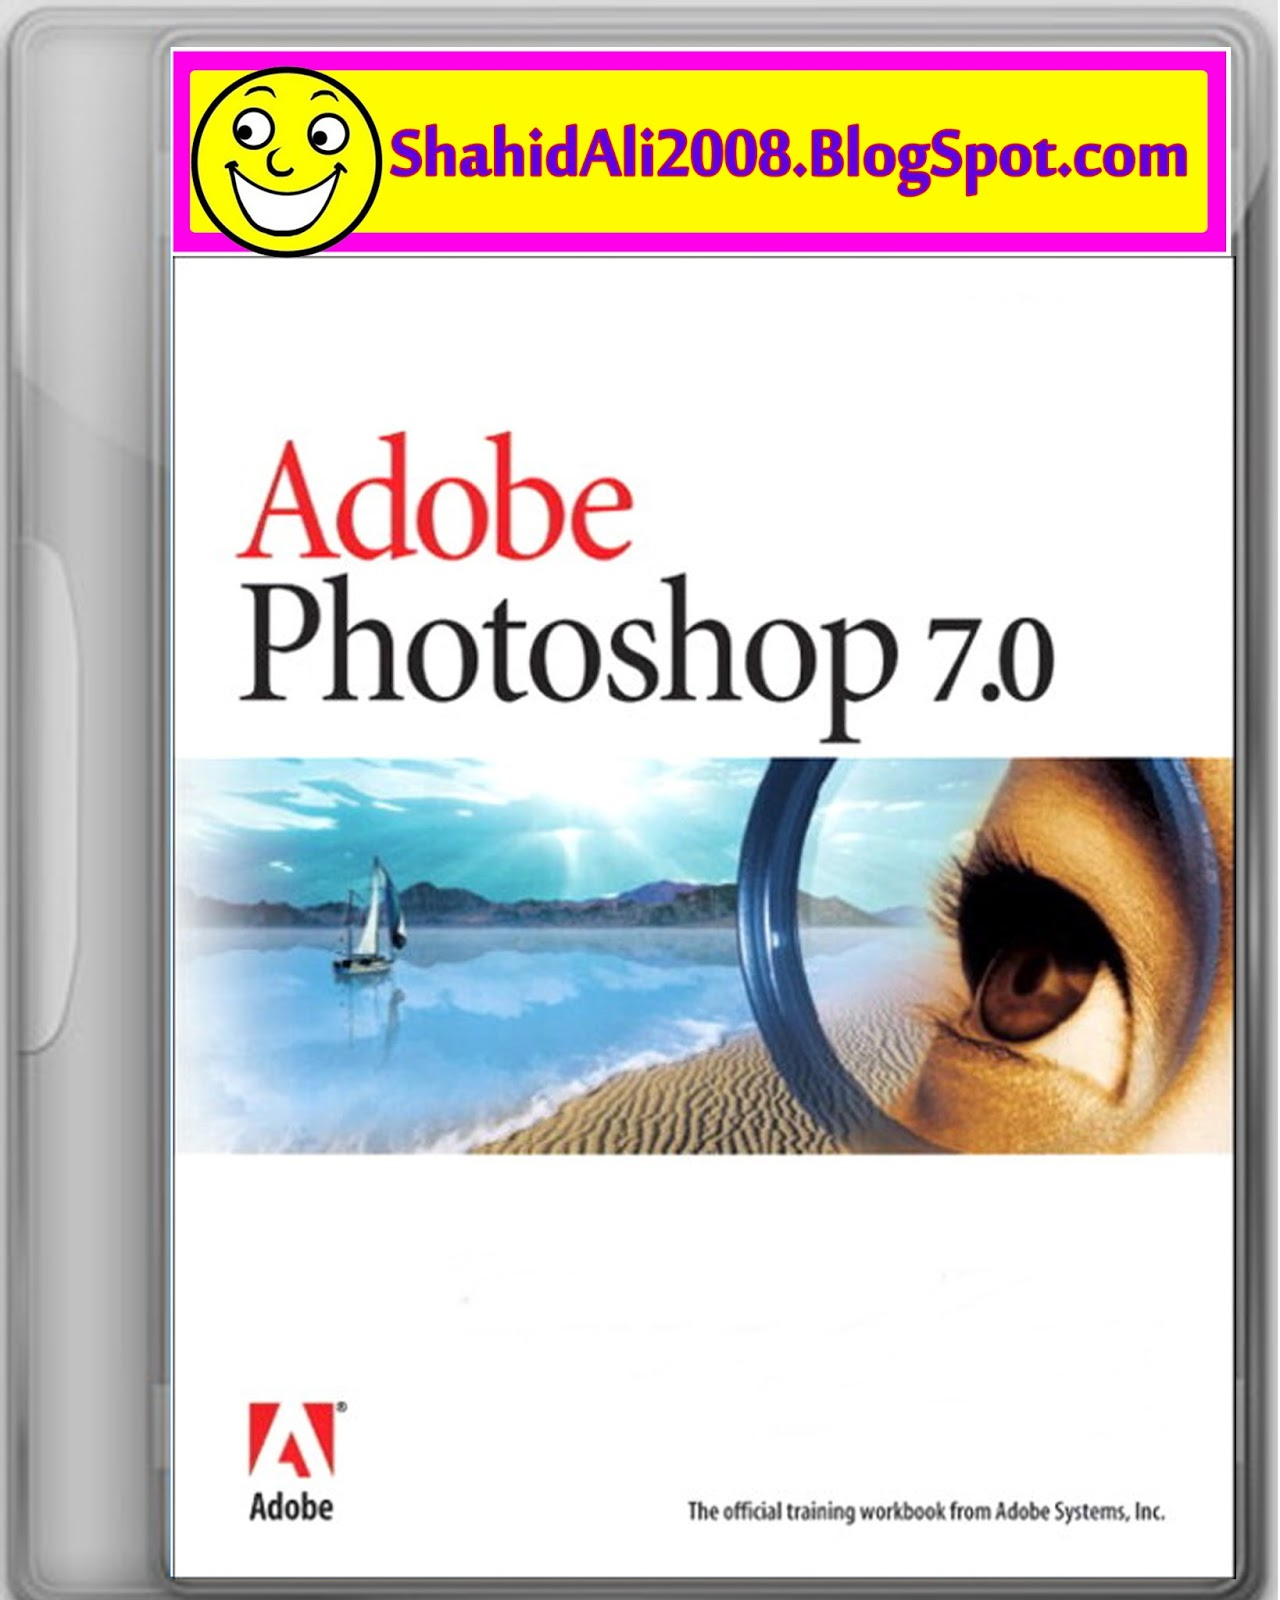 Adobe Photoshop 7 : adobe, photoshop, Computer, Softwares, Games, Adobe, Photoshop, Version, Download, Serial